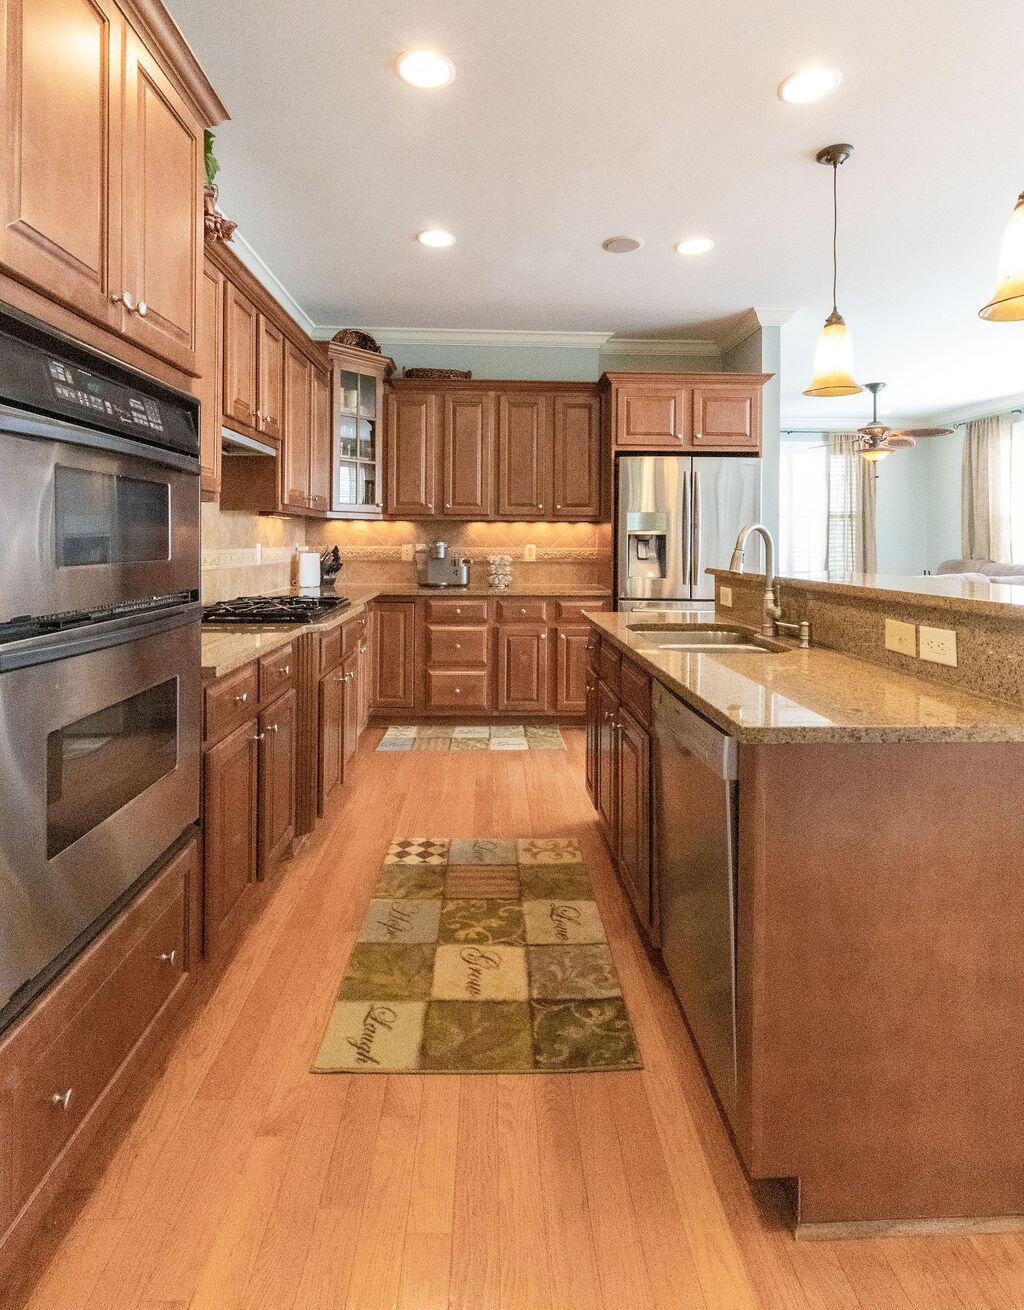 Dunes West Homes For Sale - 1220 Darts Cove, Mount Pleasant, SC - 44